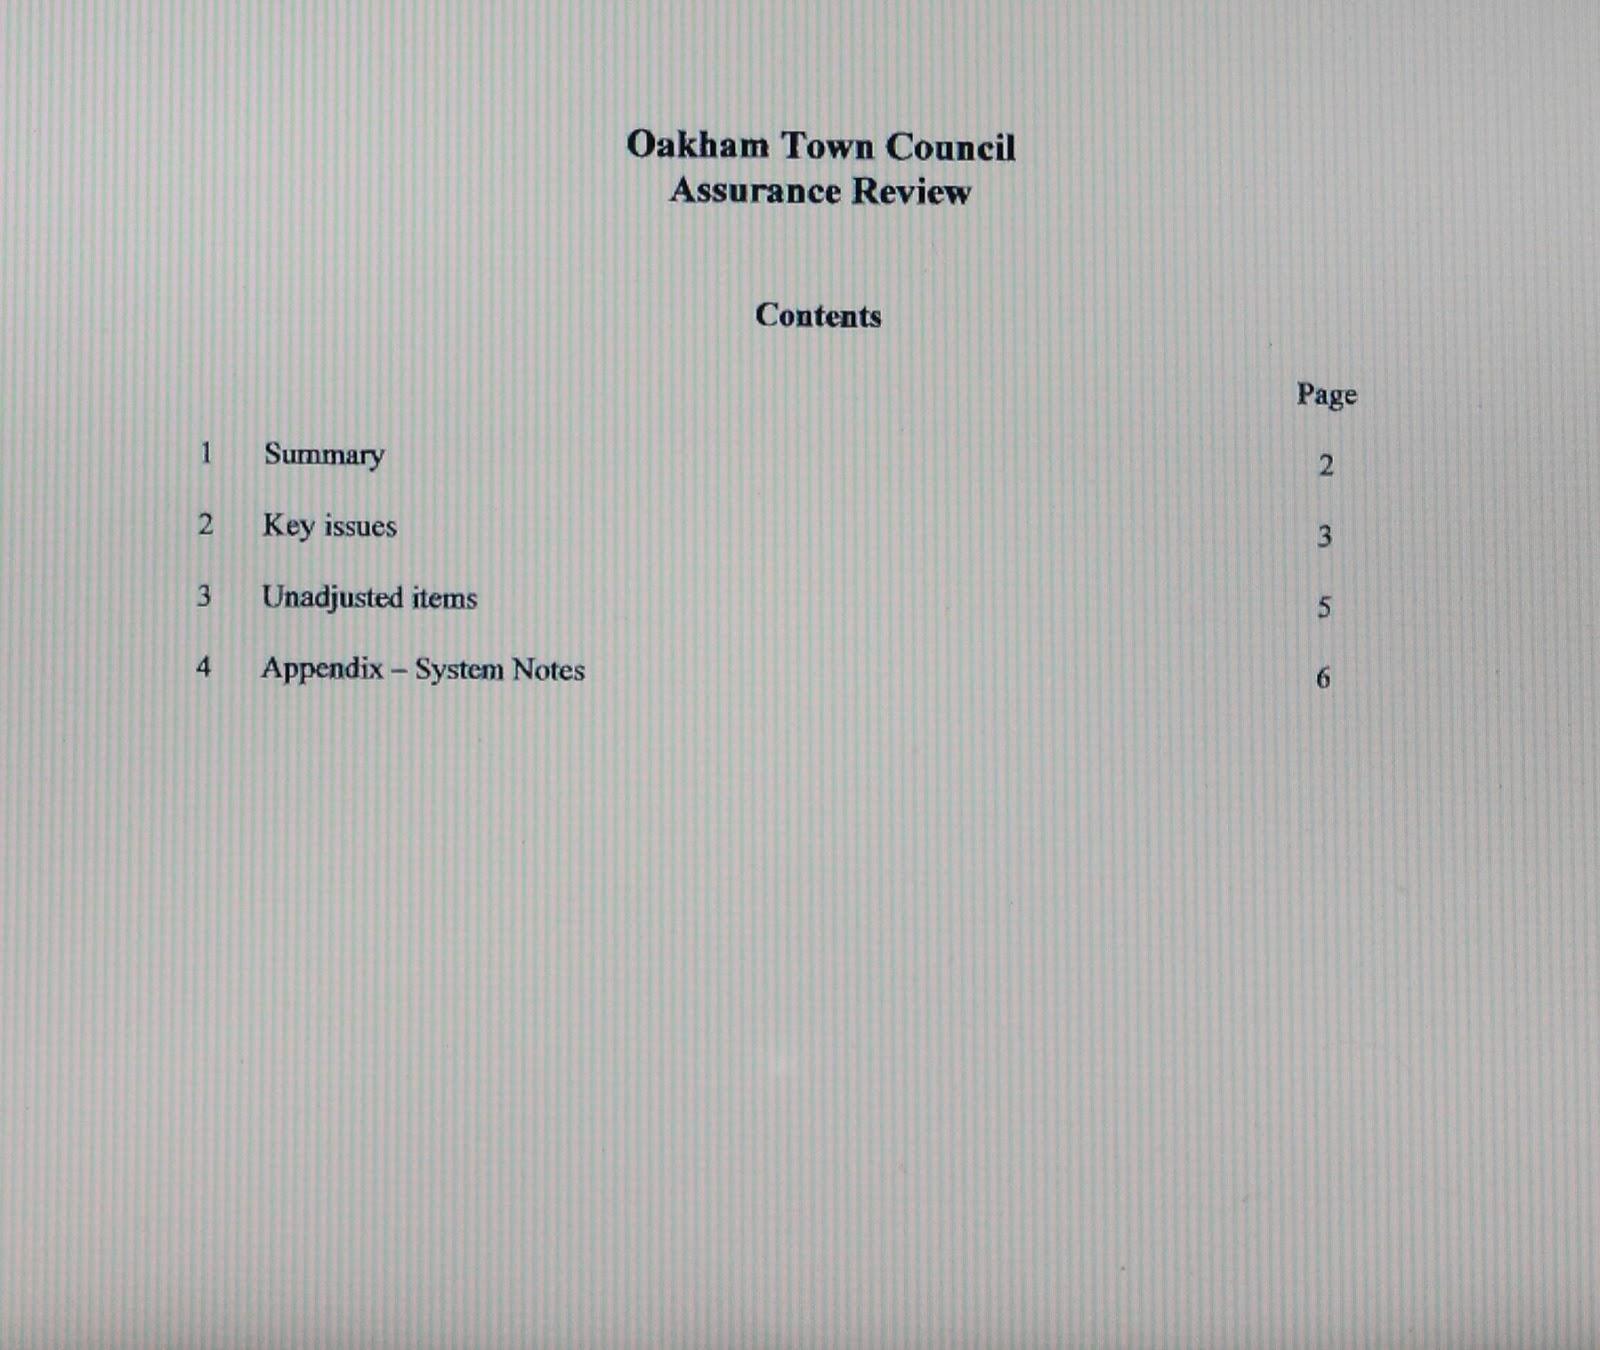 martin brookes oakham rutland england streets accountants review title page